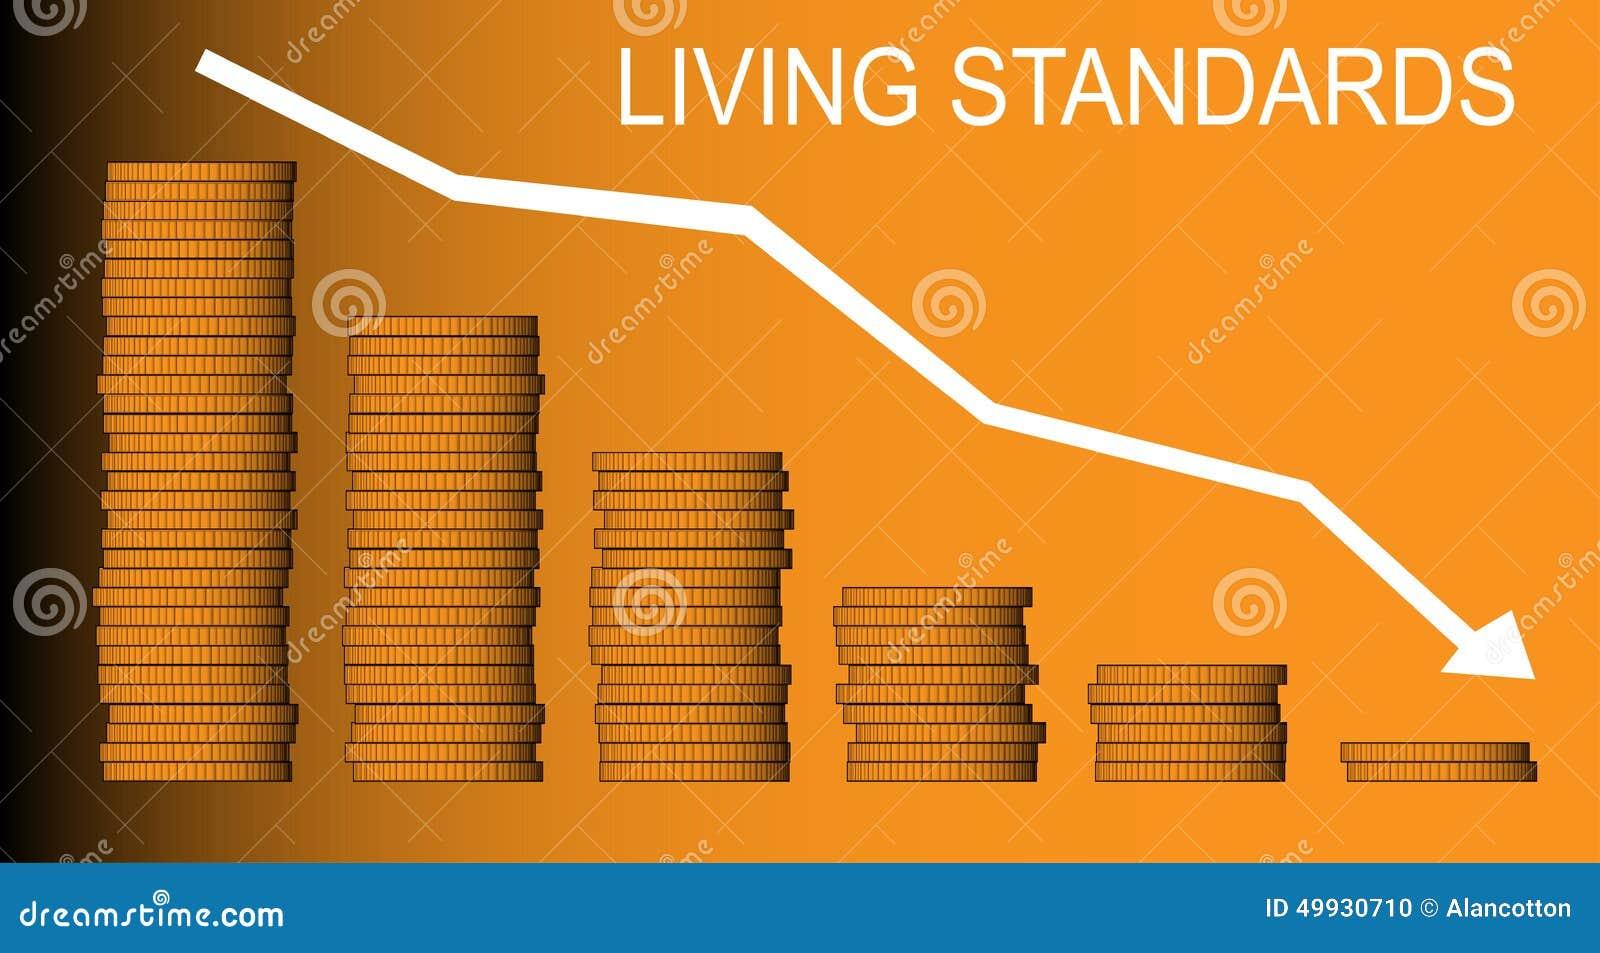 Cost U Less >> Living Standards Stock Illustration - Image: 49930710